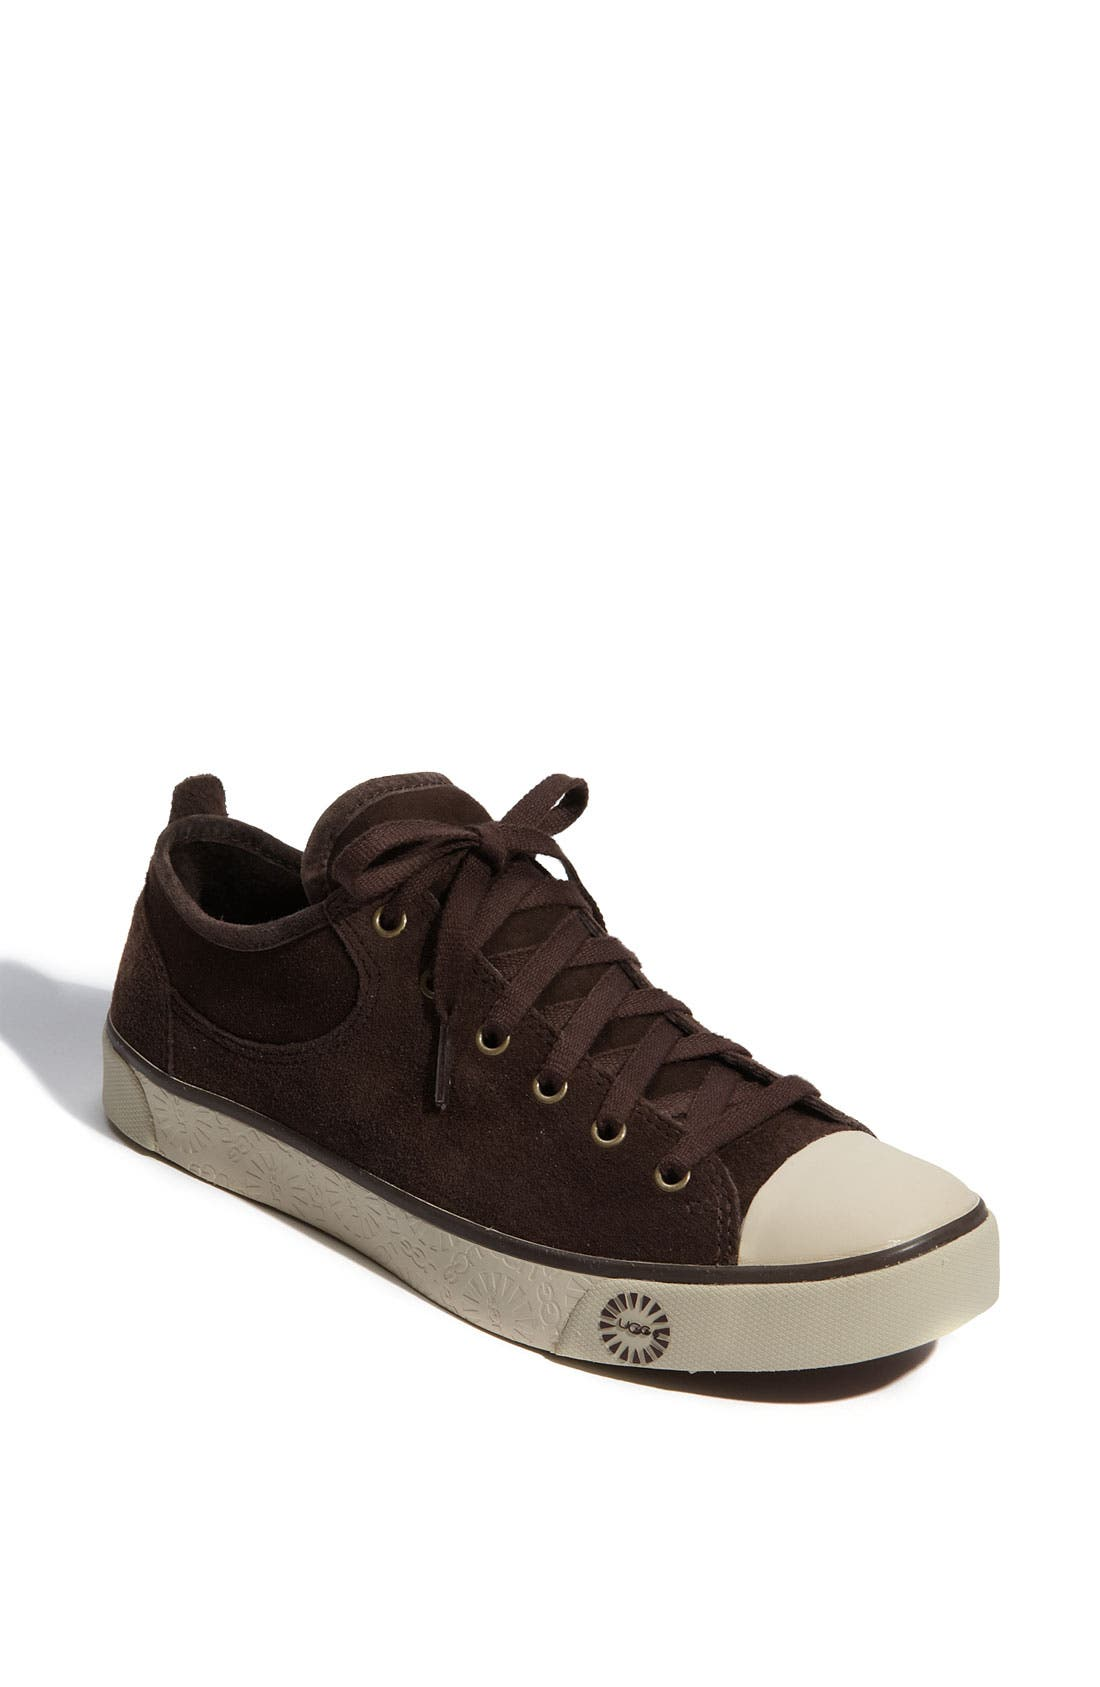 Alternate Image 1 Selected - UGG® Australia 'Evera' Suede Sneaker (Women)